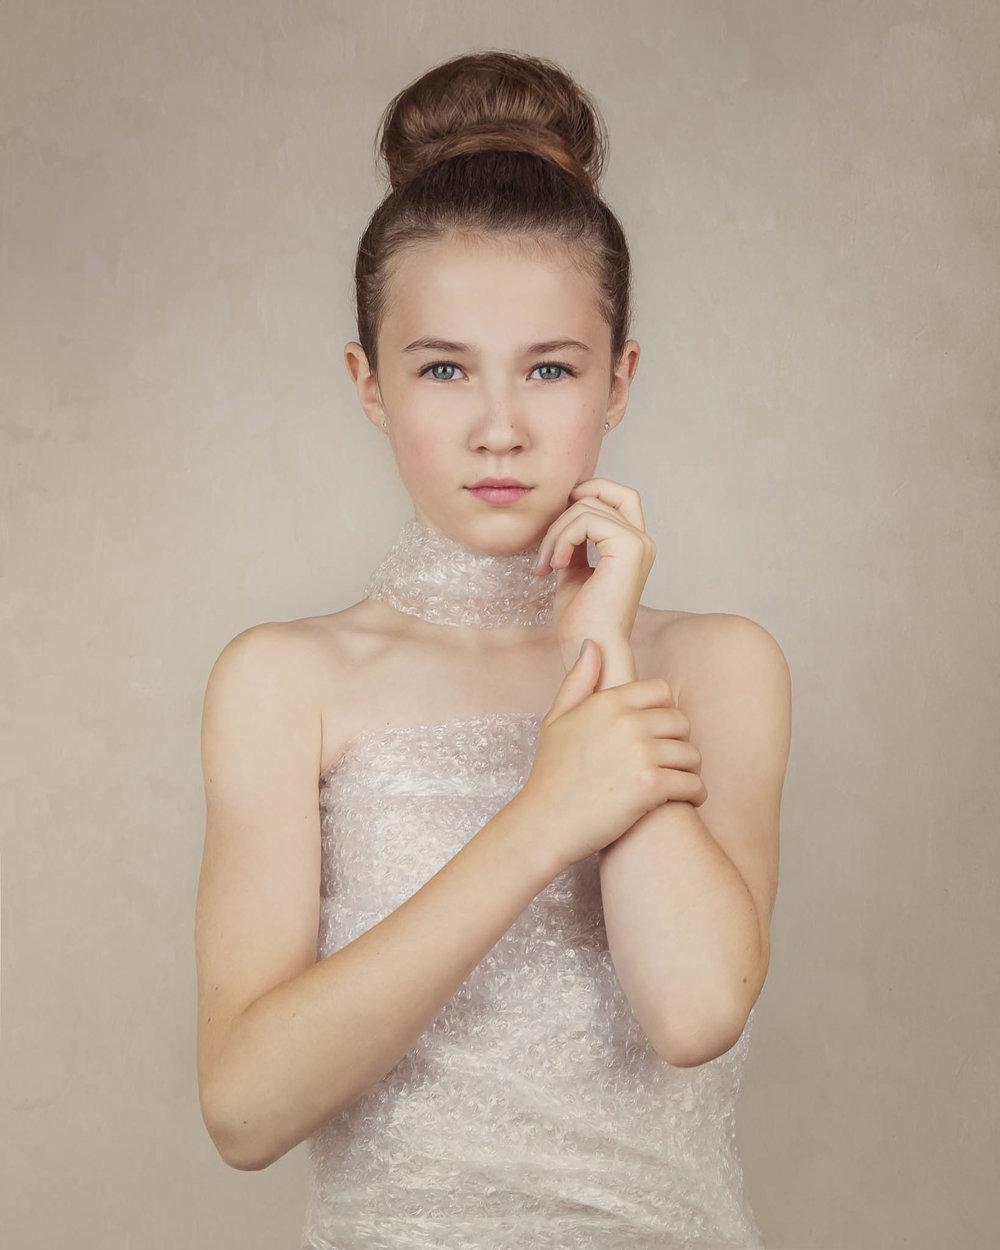 02-alana-lee-bubble wrap girl_opal_once upon a time_ICP.jpg